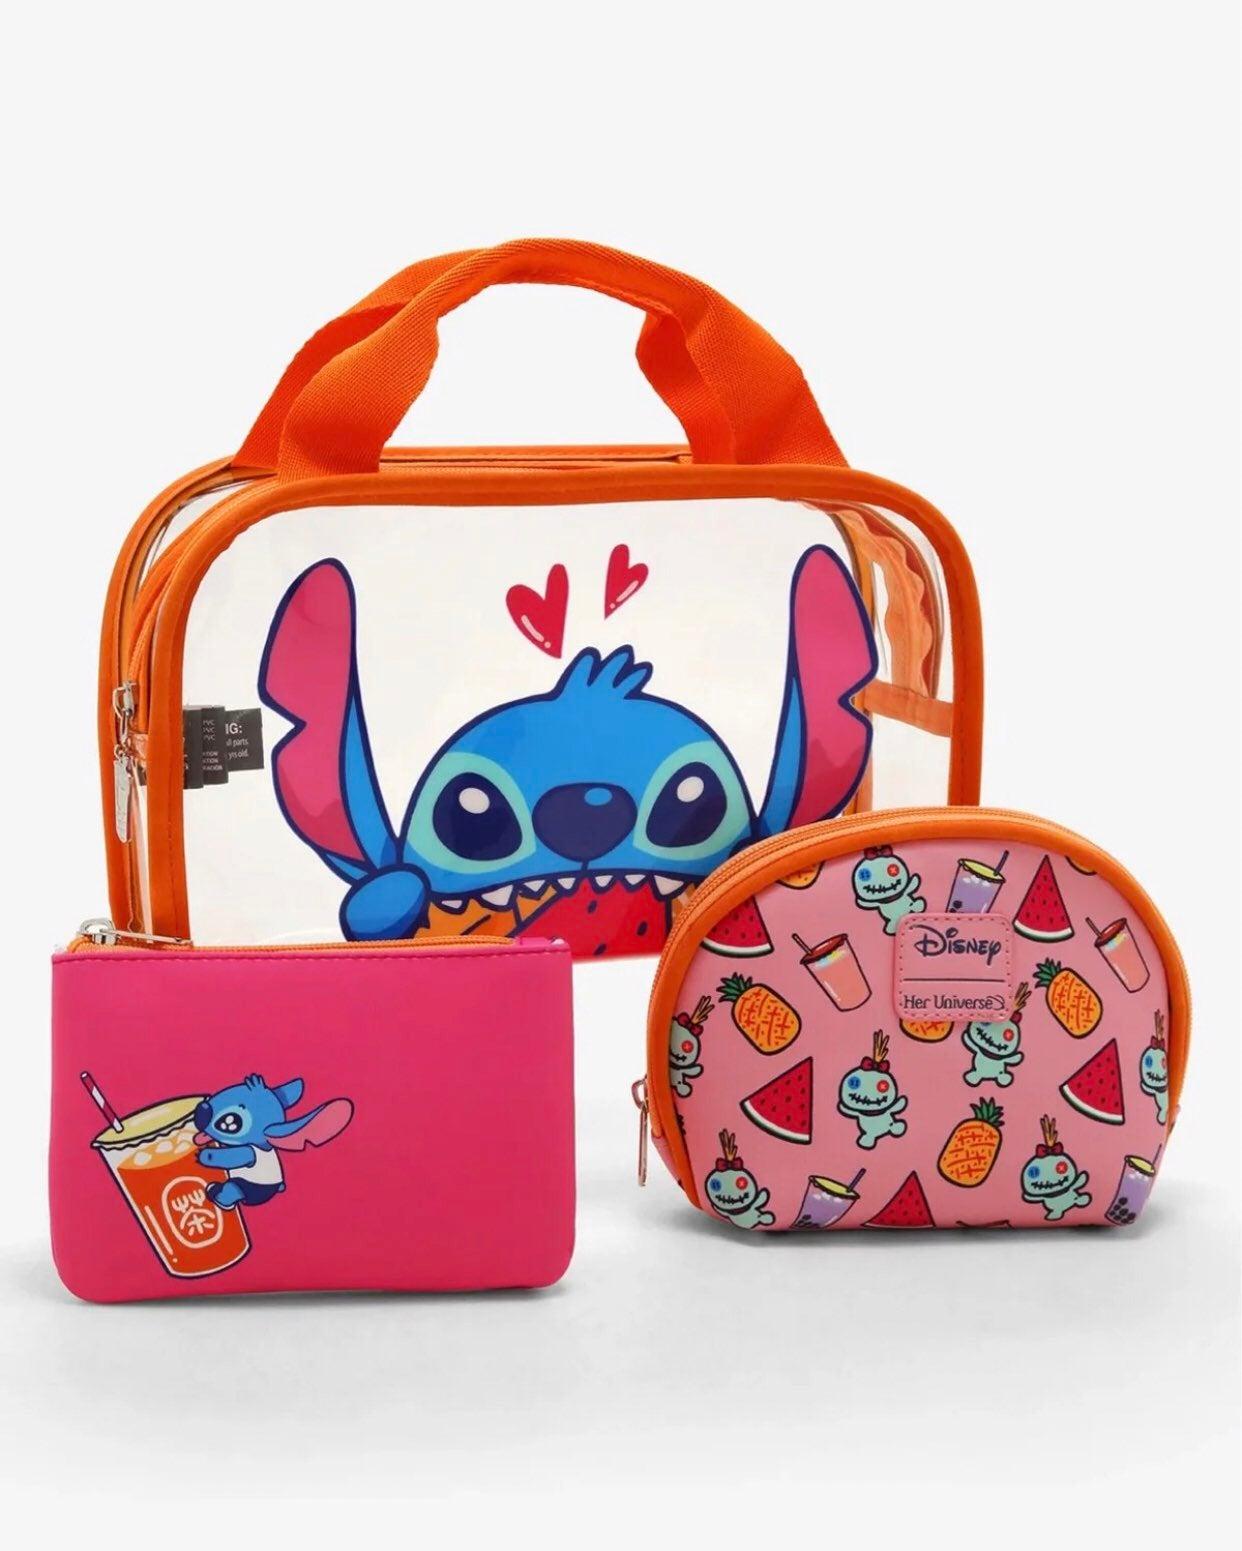 Disney Lilo & Stitch Fruit Cosmetic Bag